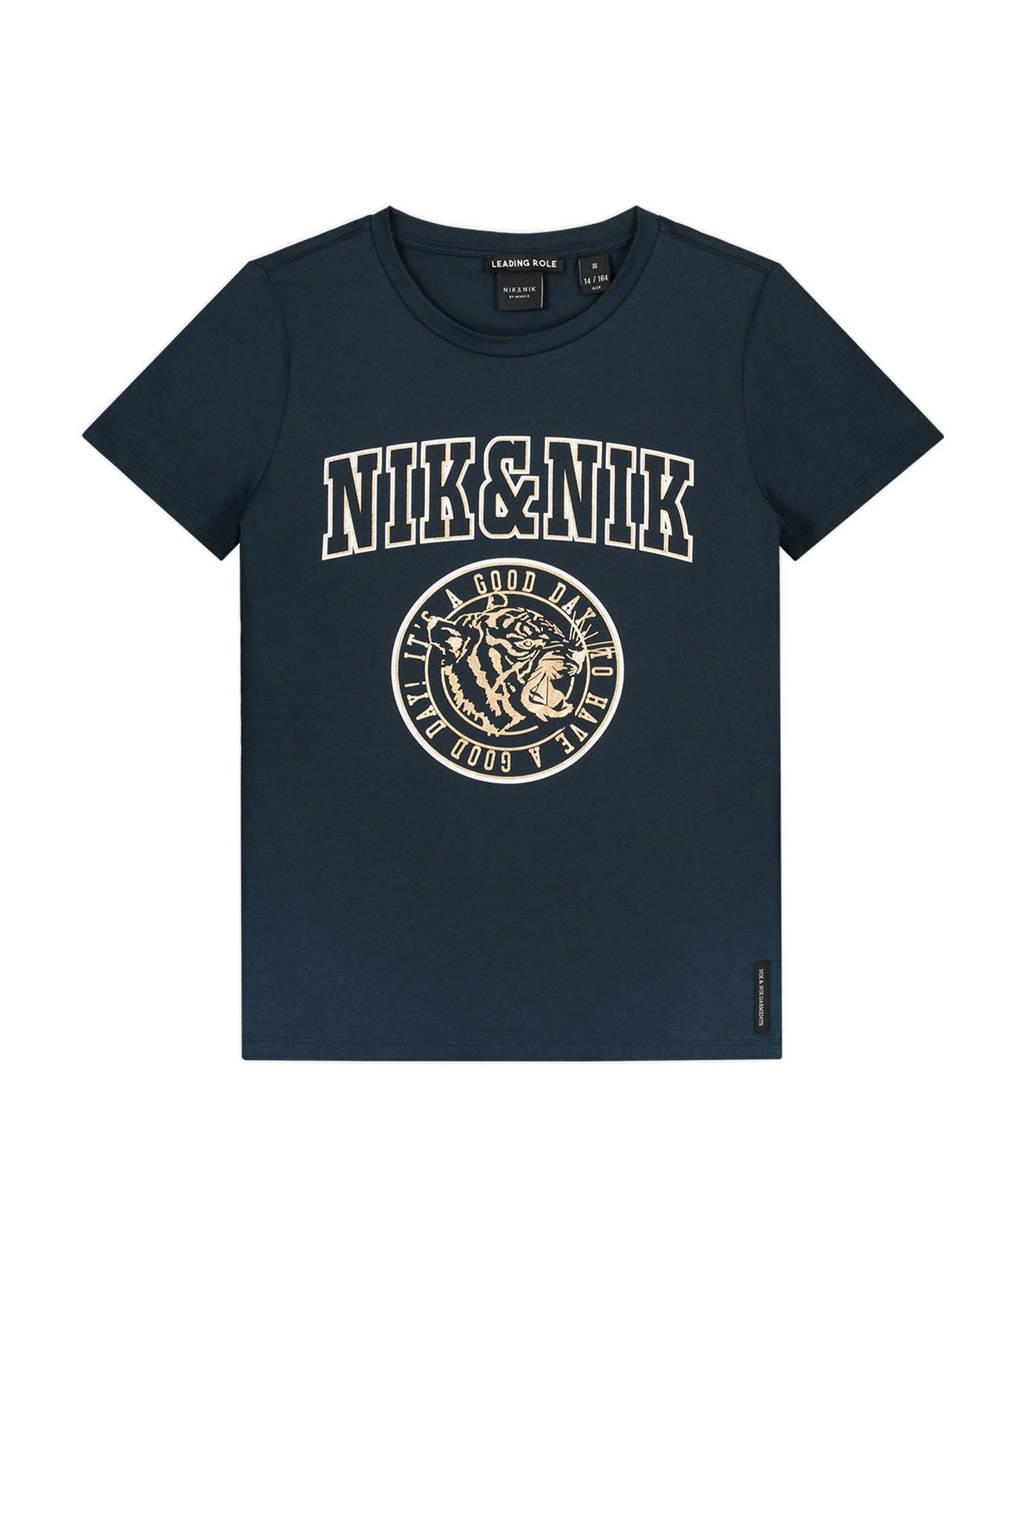 NIK&NIK T-shirt Poppy met logo donkerblauw, Donkerblauw